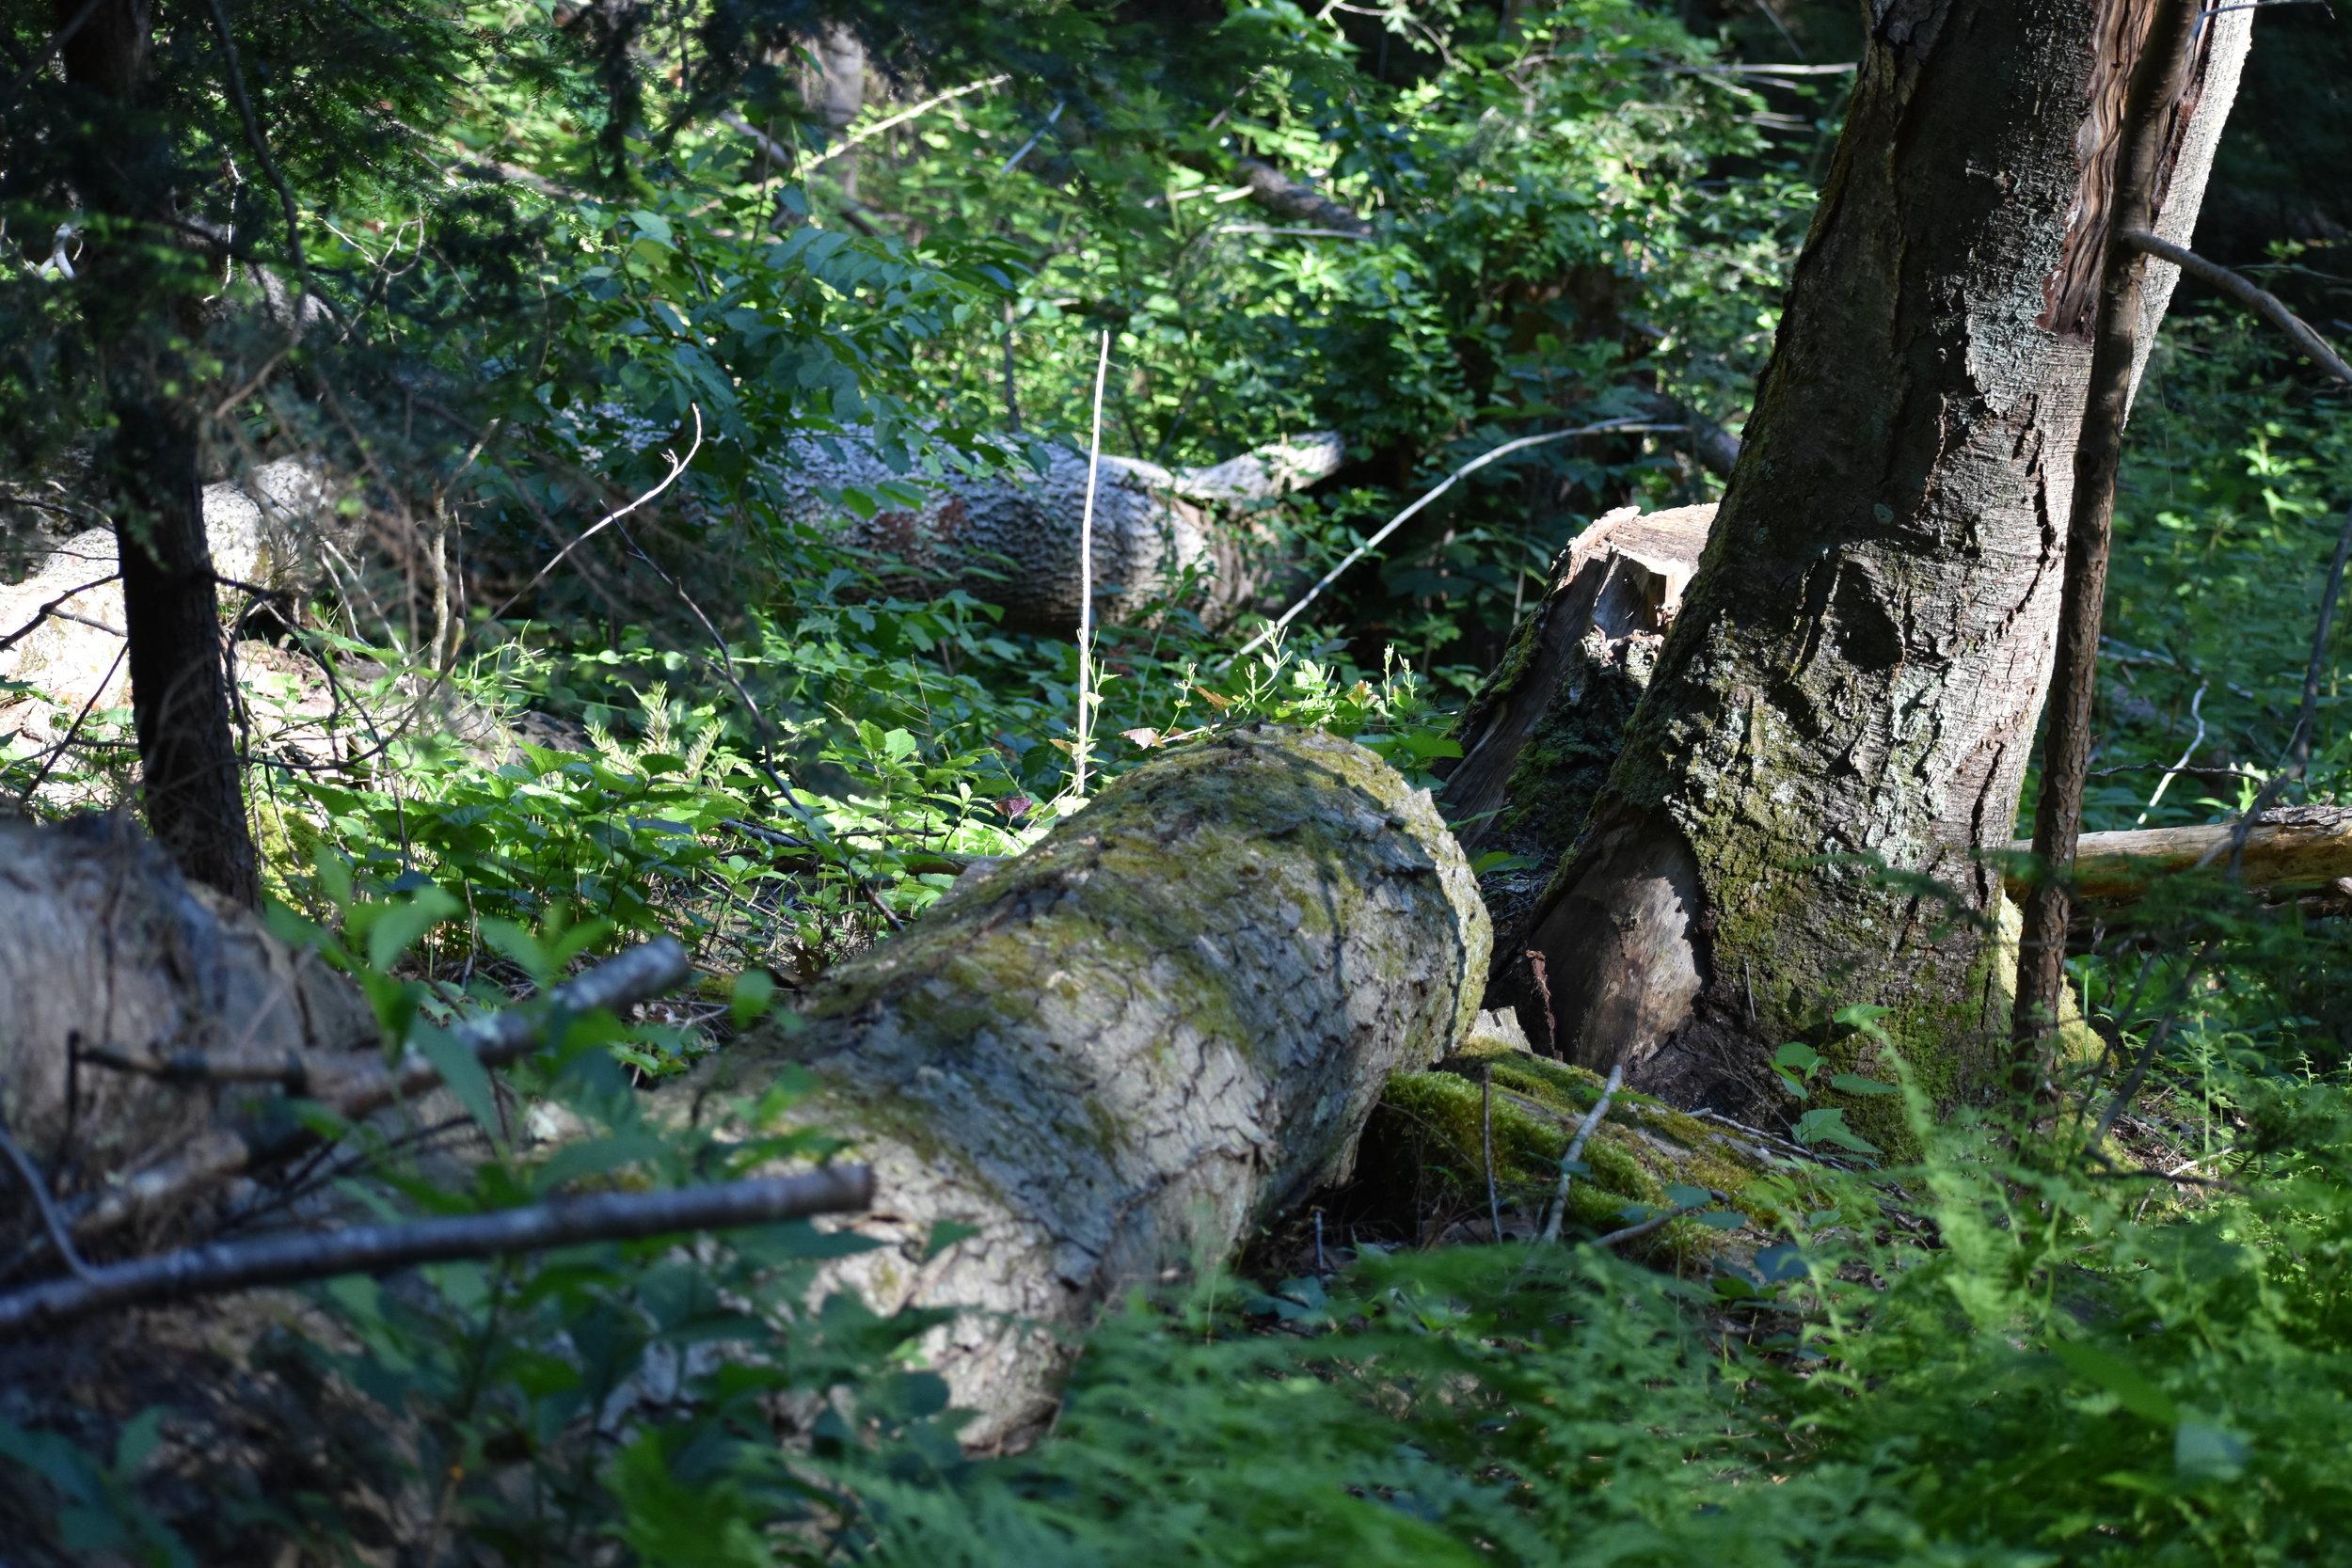 Hooded Warbler Habitat: tree fall gap - note dense shrubbery in background